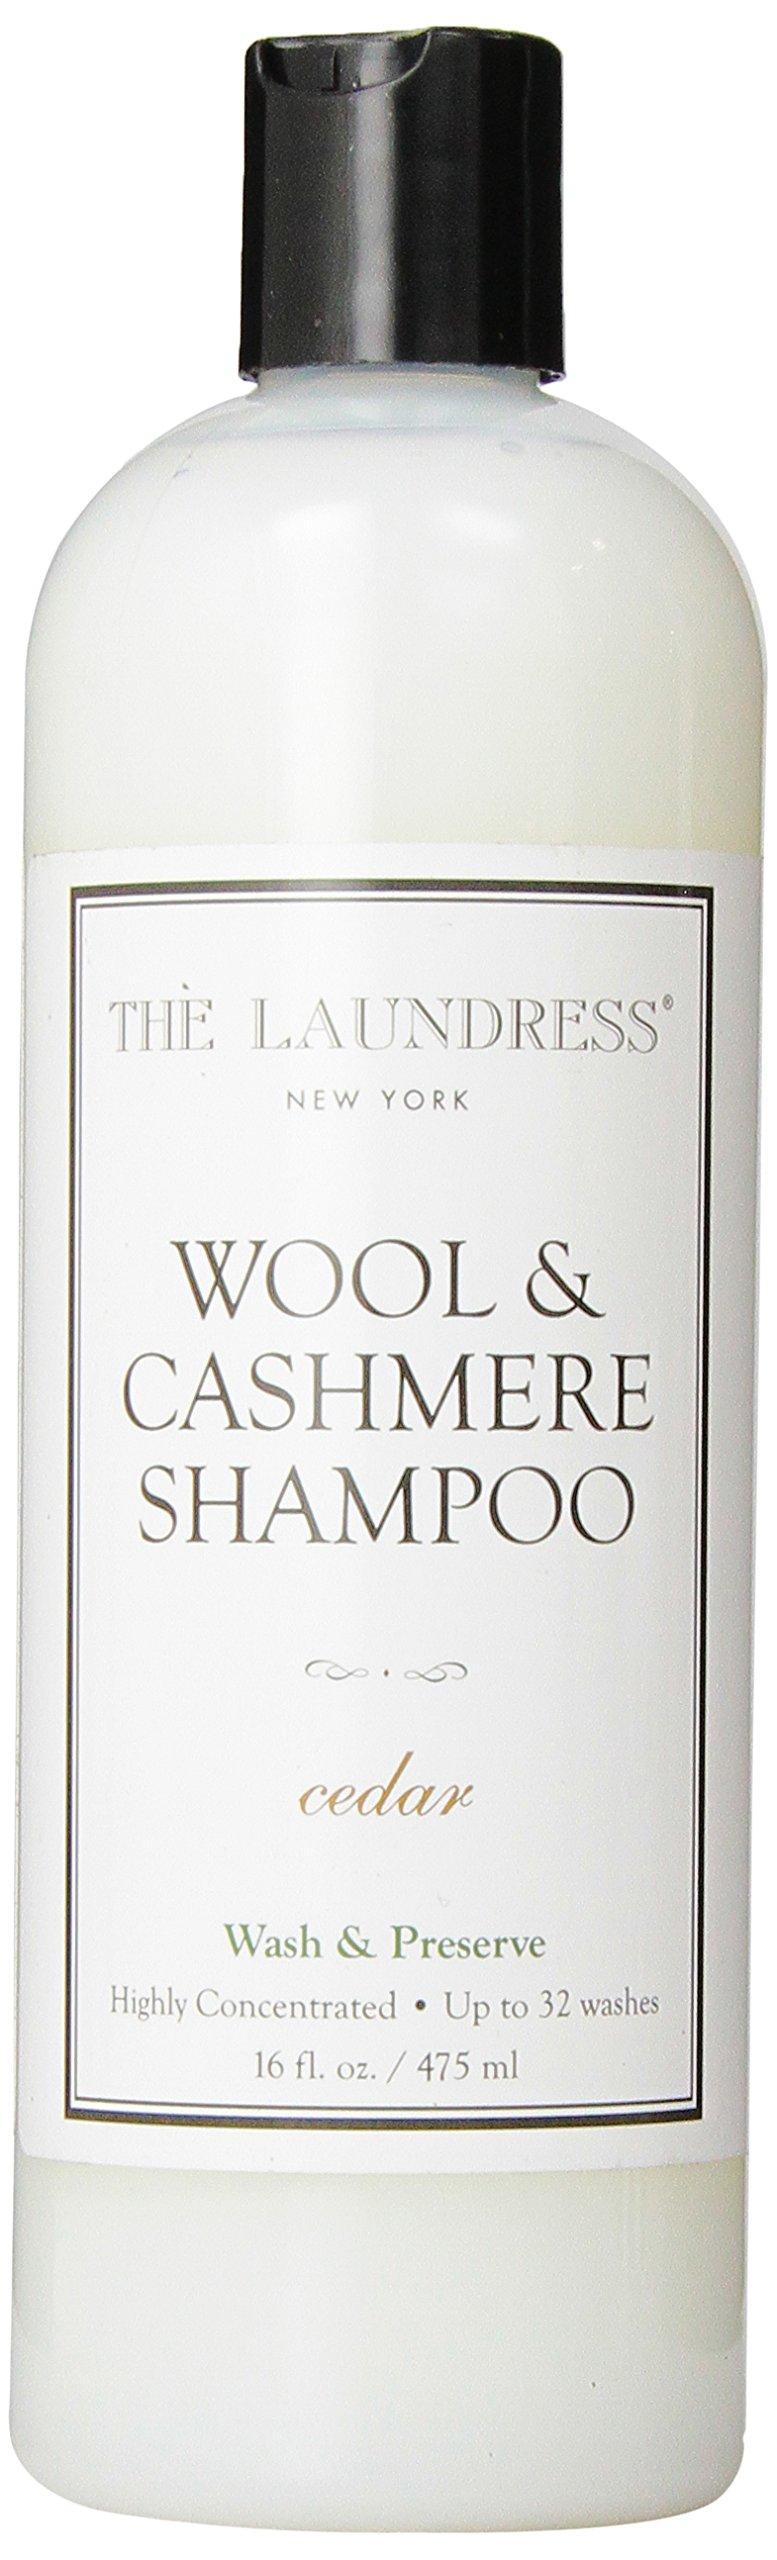 The Laundress Wool & Cashmere Shampoo, Cedar, 16 fl. oz. – 32 loads